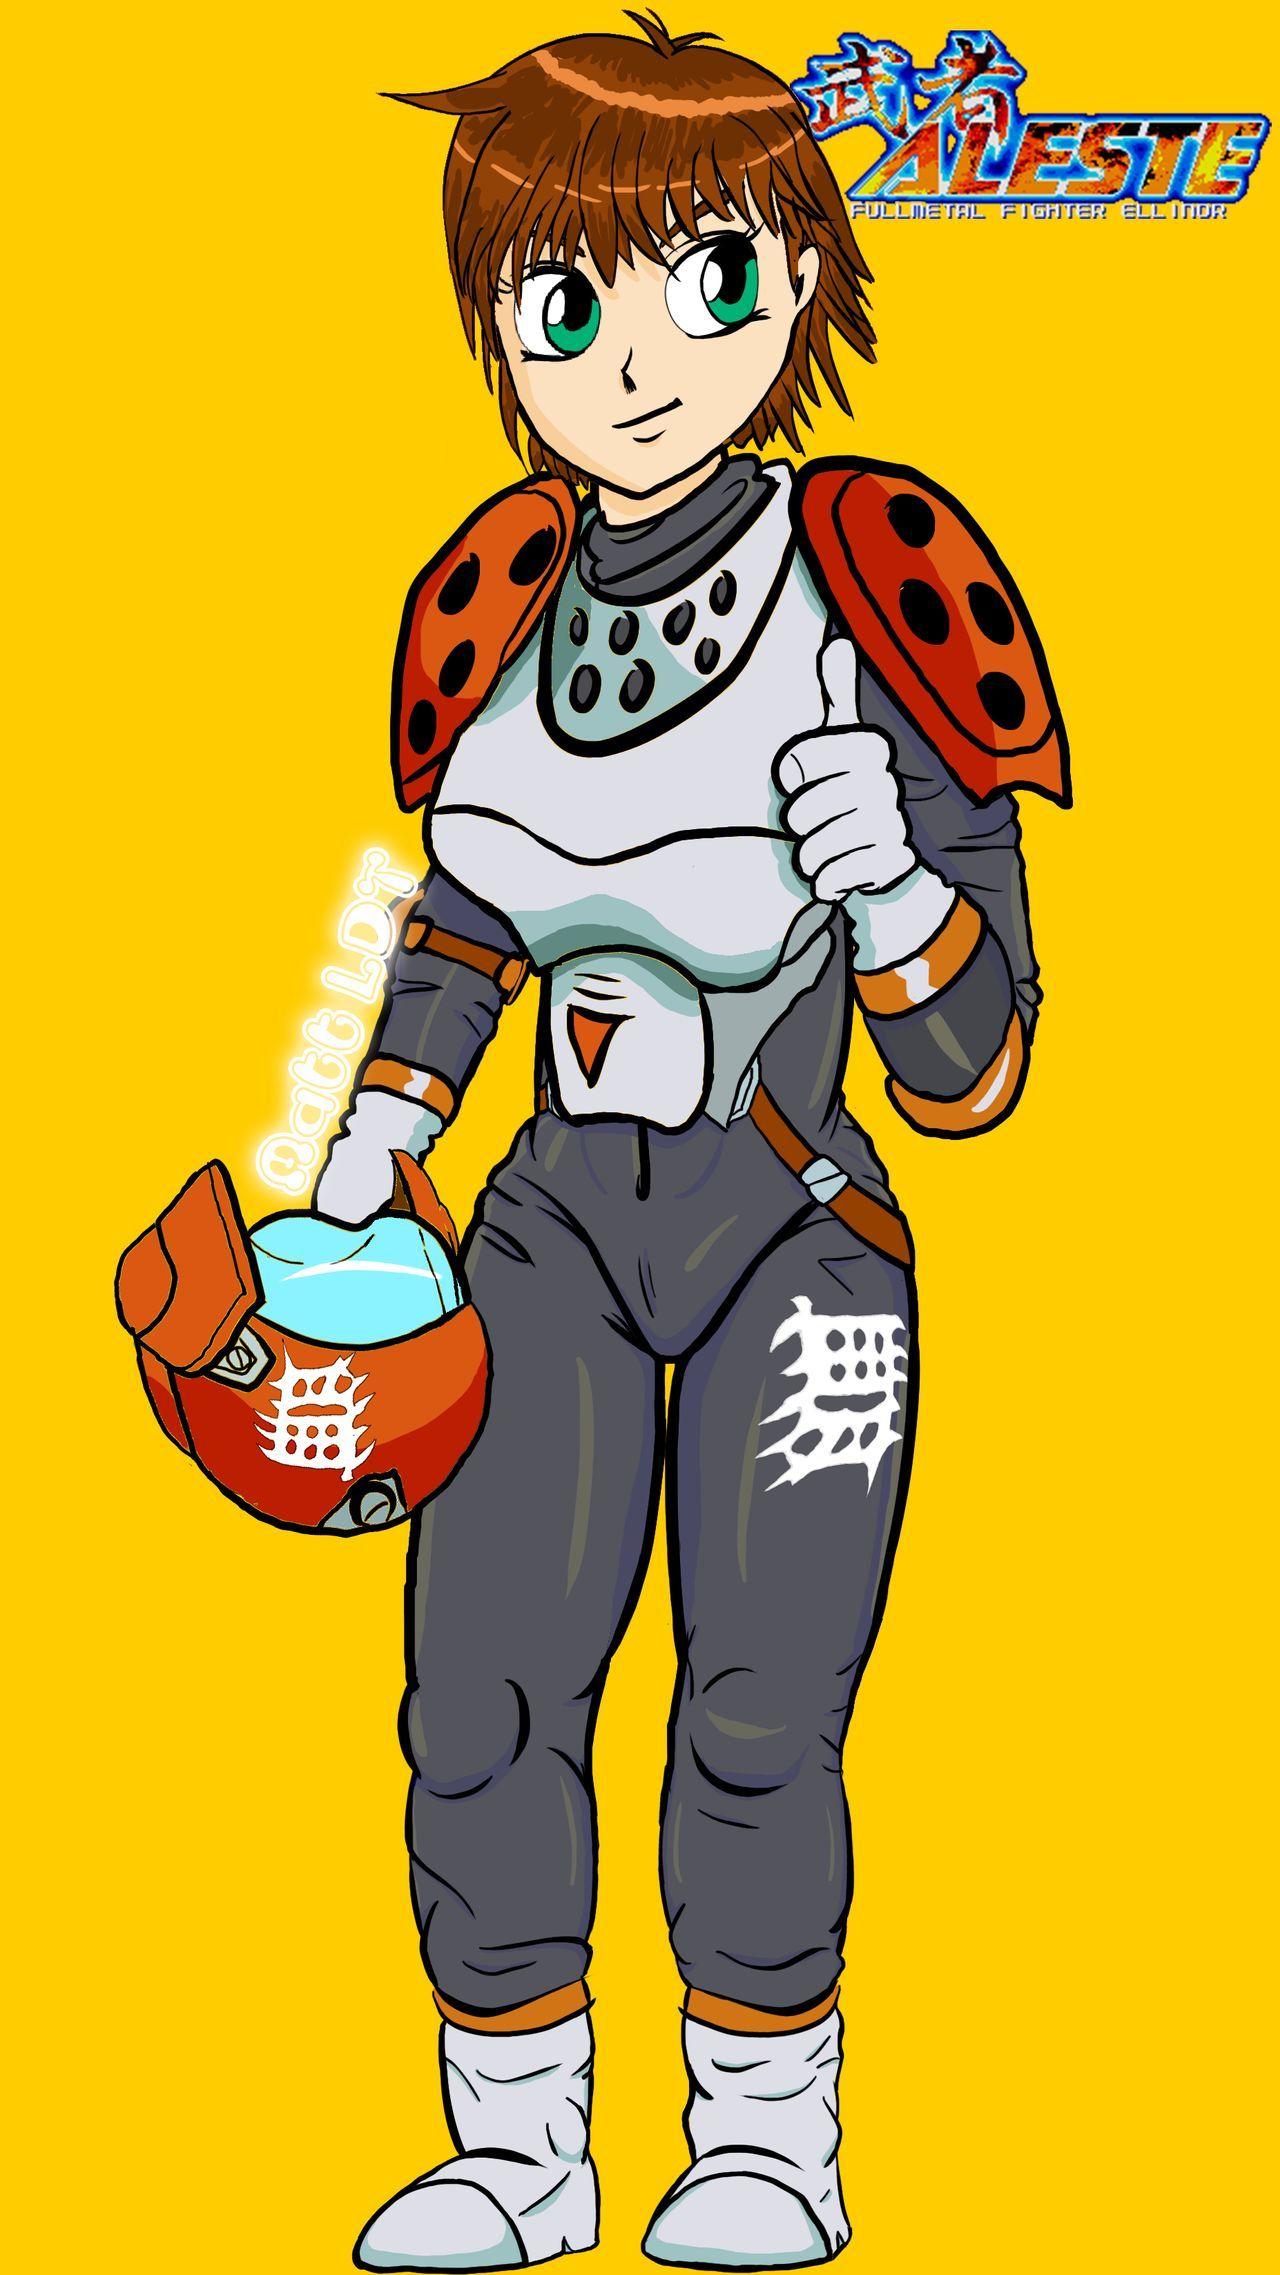 Ellinor From Musha Aleste On Mega Drive Genesis By Mattldt On Deviantart Cool Gifs Fire Emblem Character